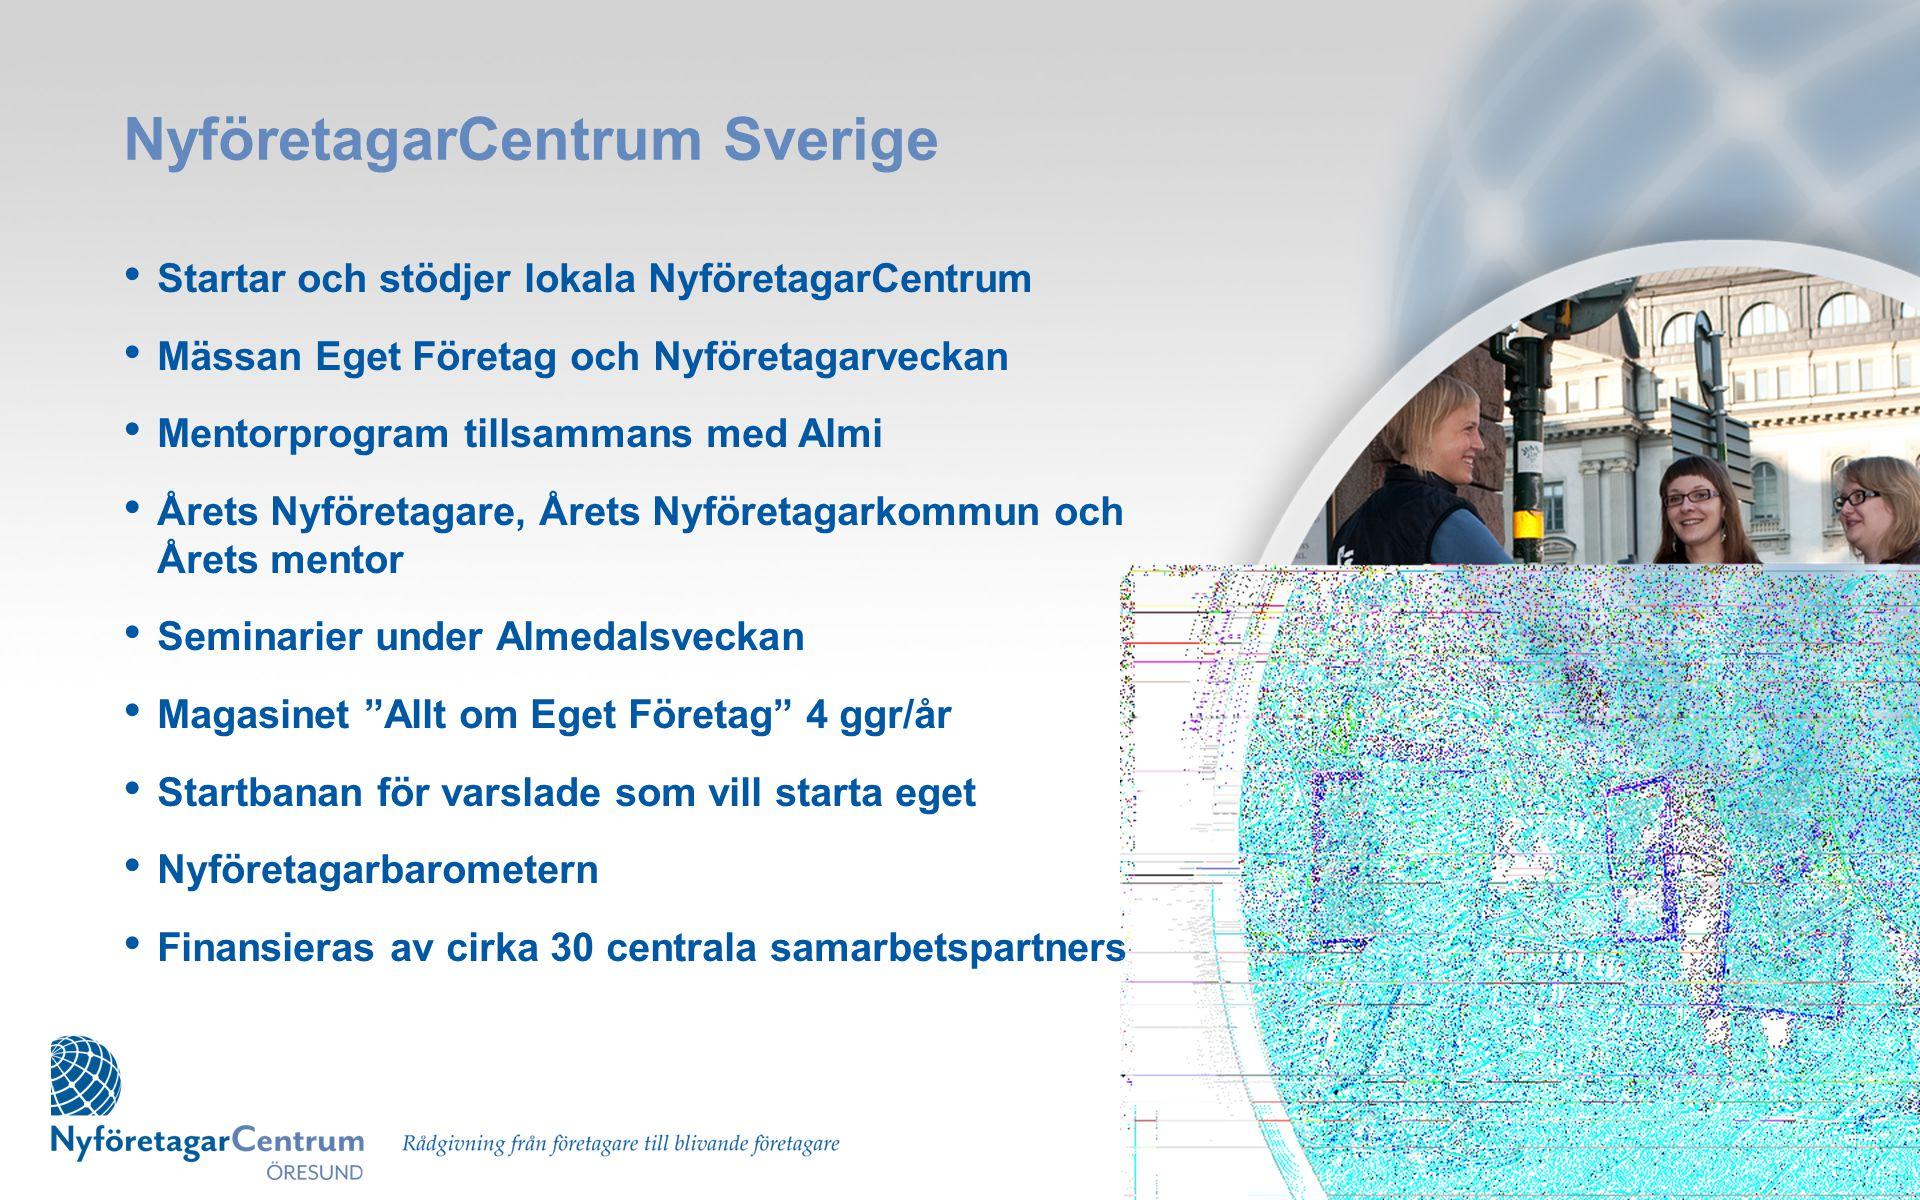 NyföretagarCentrum Sverige